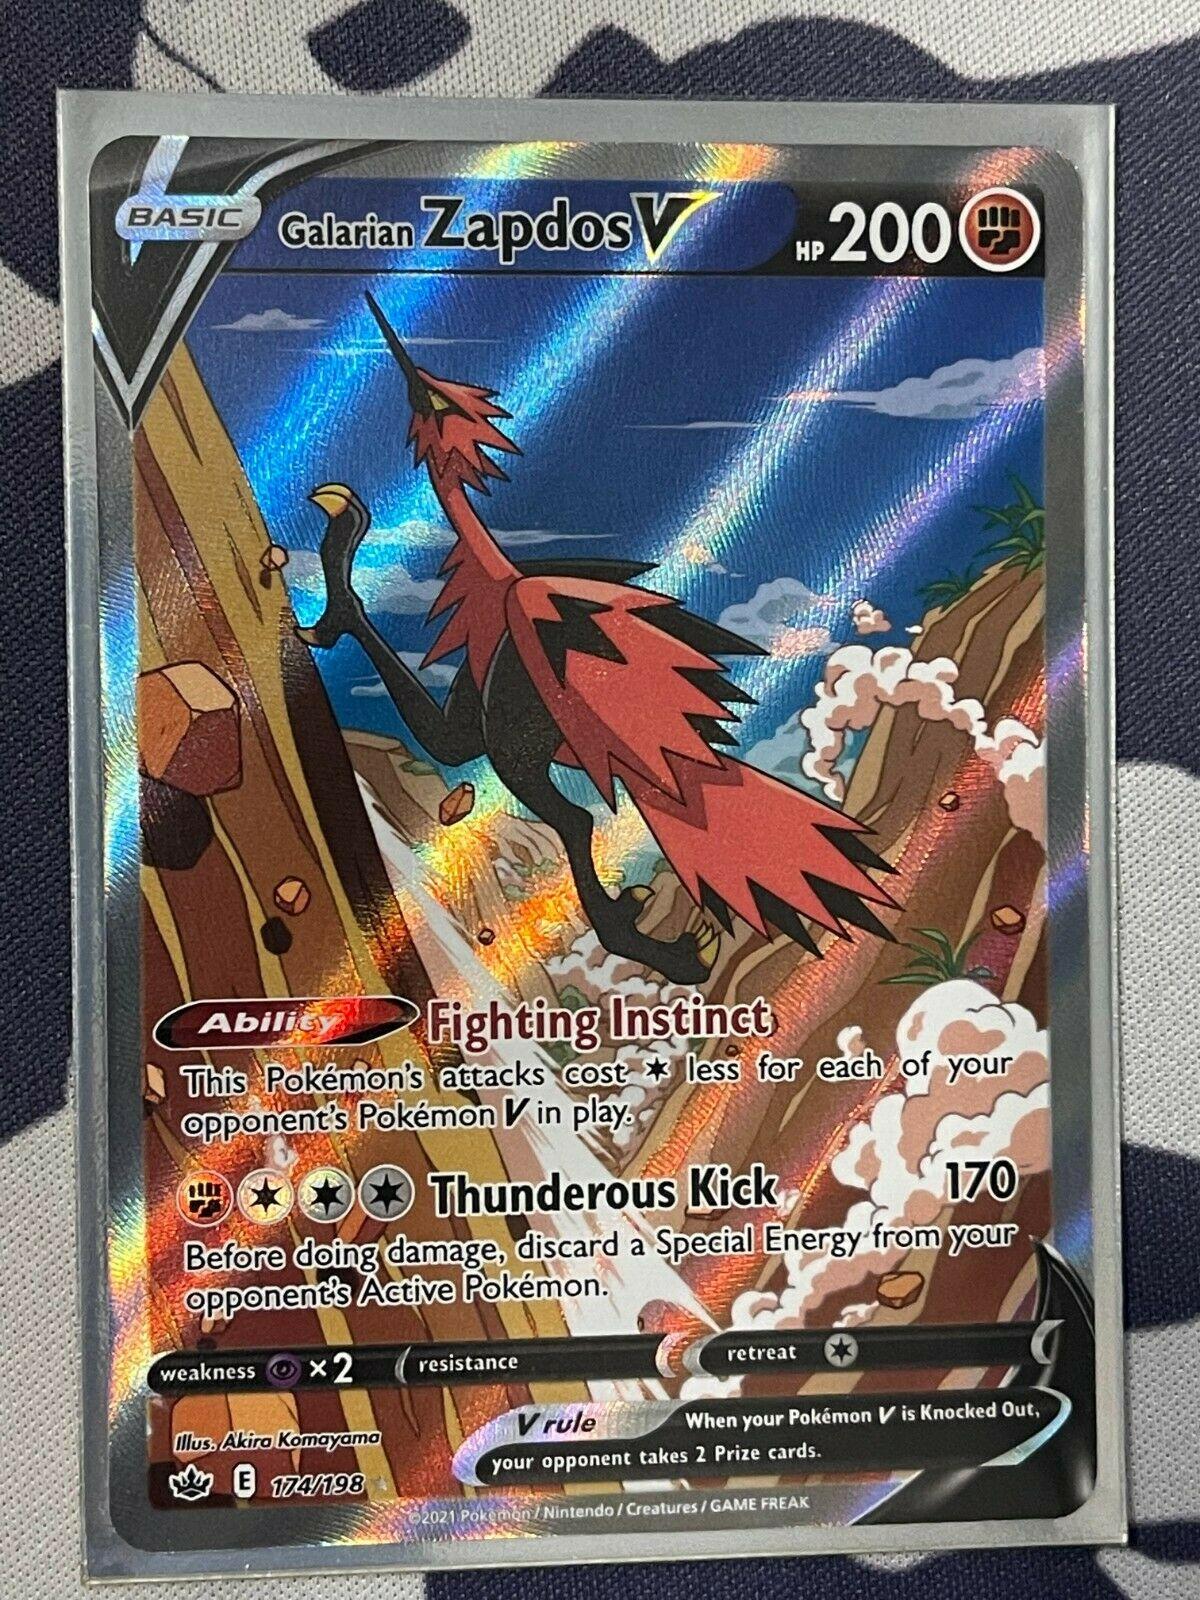 Chilling Reign Galarian Zapdos V Alt Art 174/198 Pokémon Mint/Near Mint